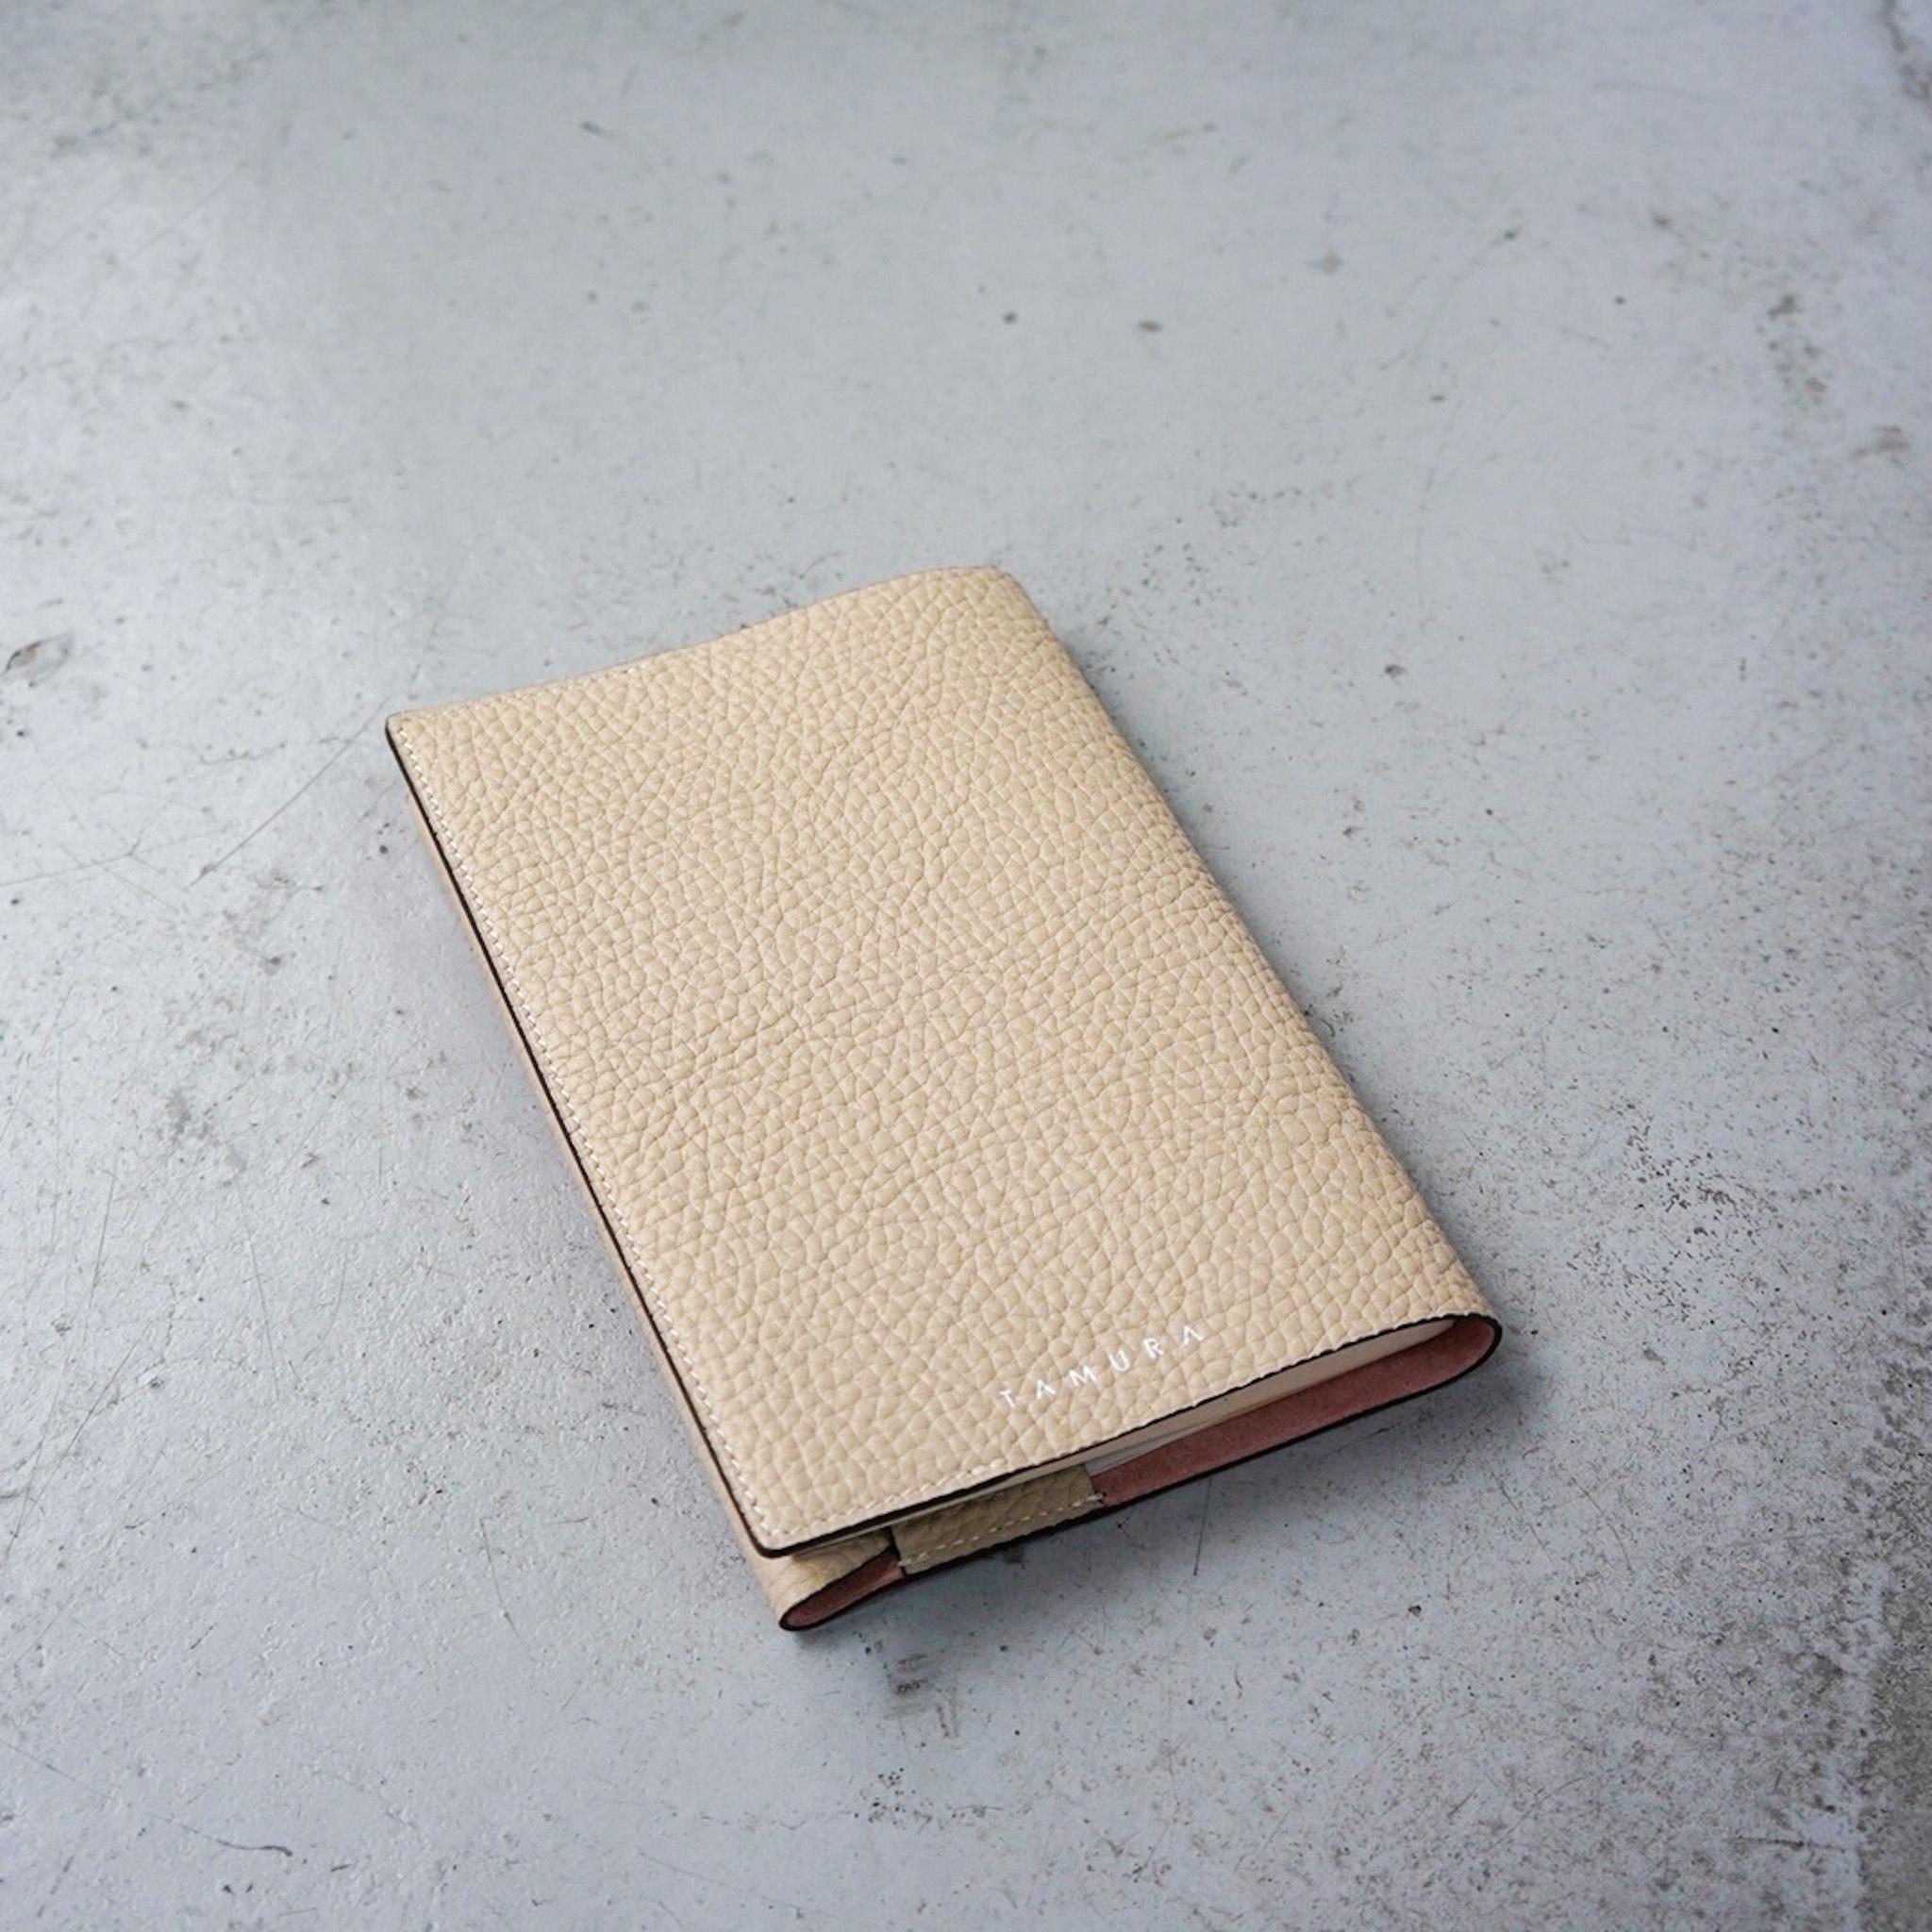 BOOK COVER(文庫サイズ)ベージュ × ピンク